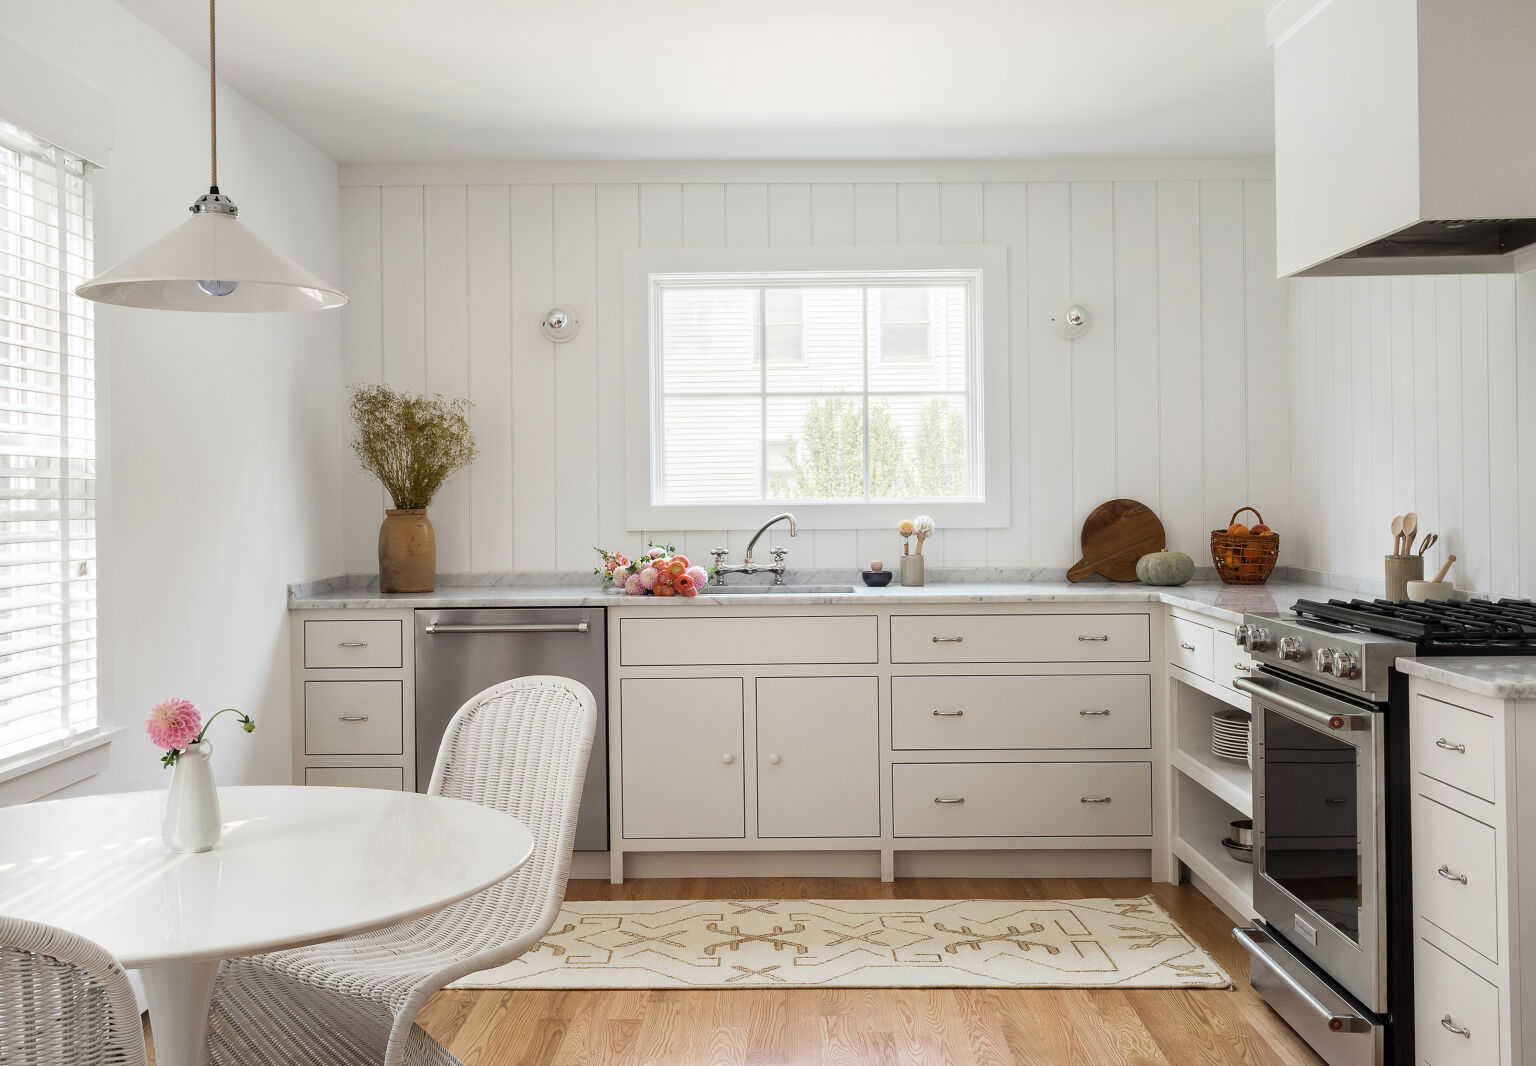 nikki amodio kitchen joyelle west 1536x1066